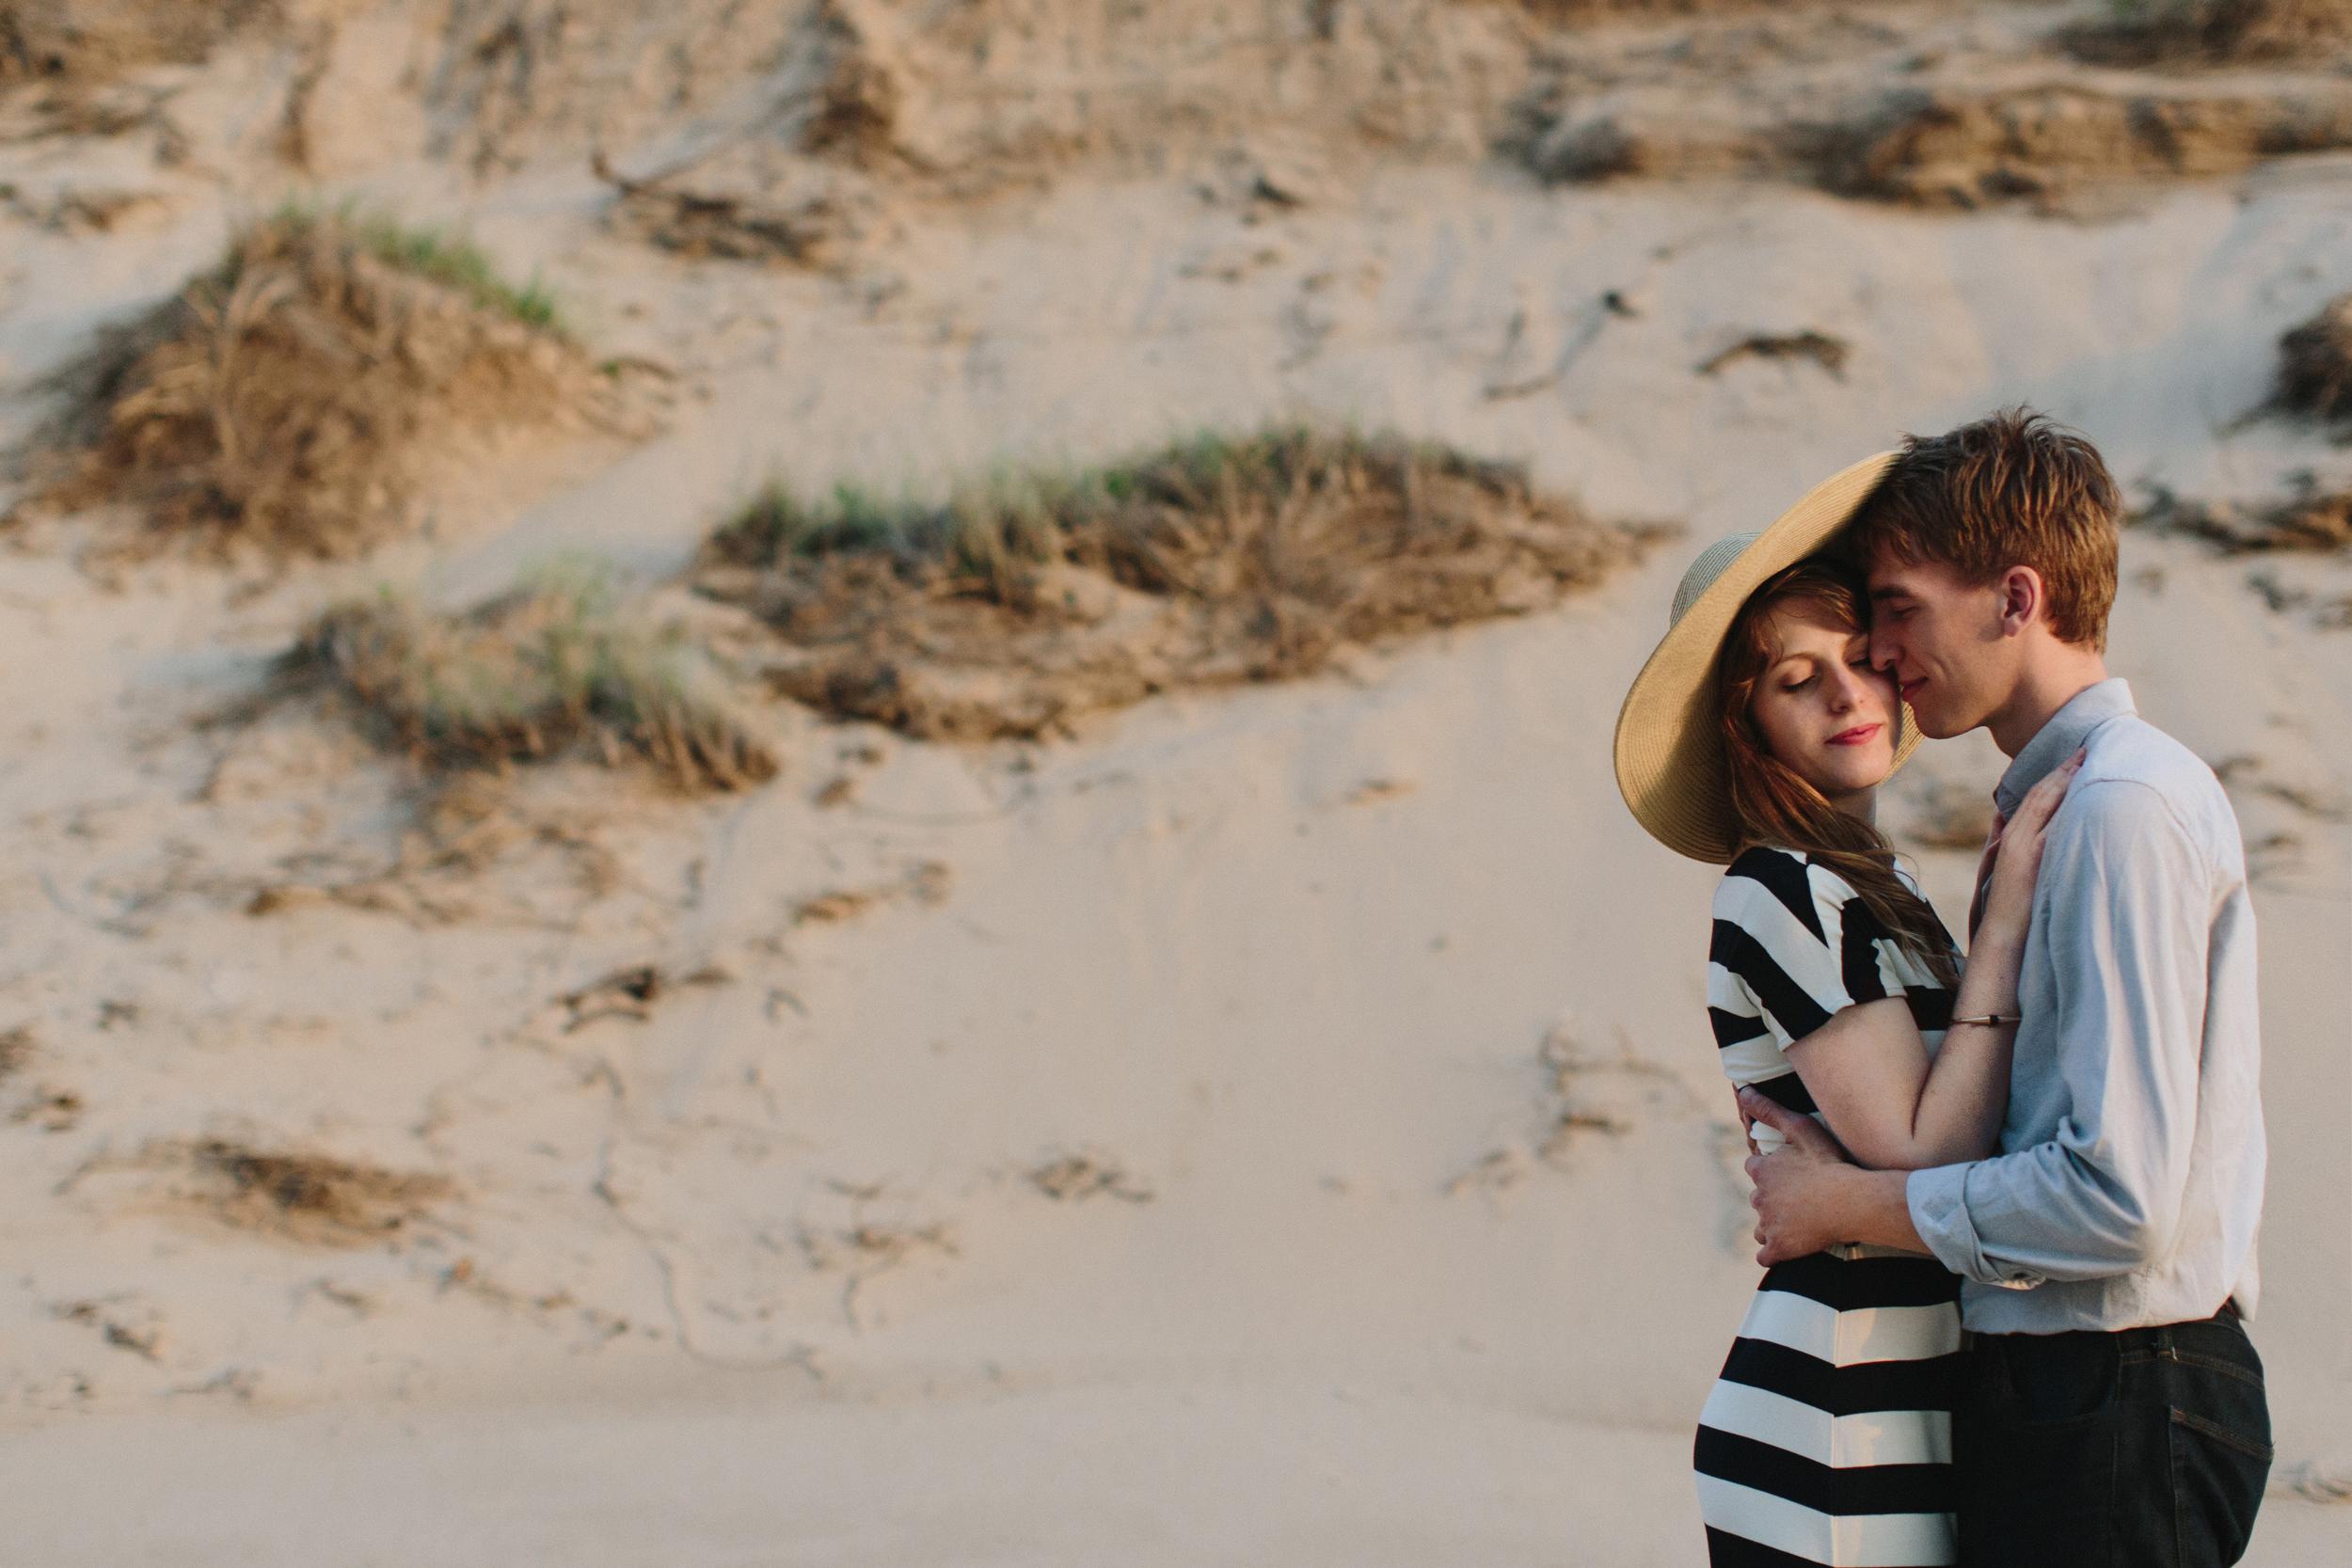 Lake-Michigan-Engagement-Session-Lifestyle-Wedding-Photographer-Mae-Stier-Candid-Photography-007.jpg